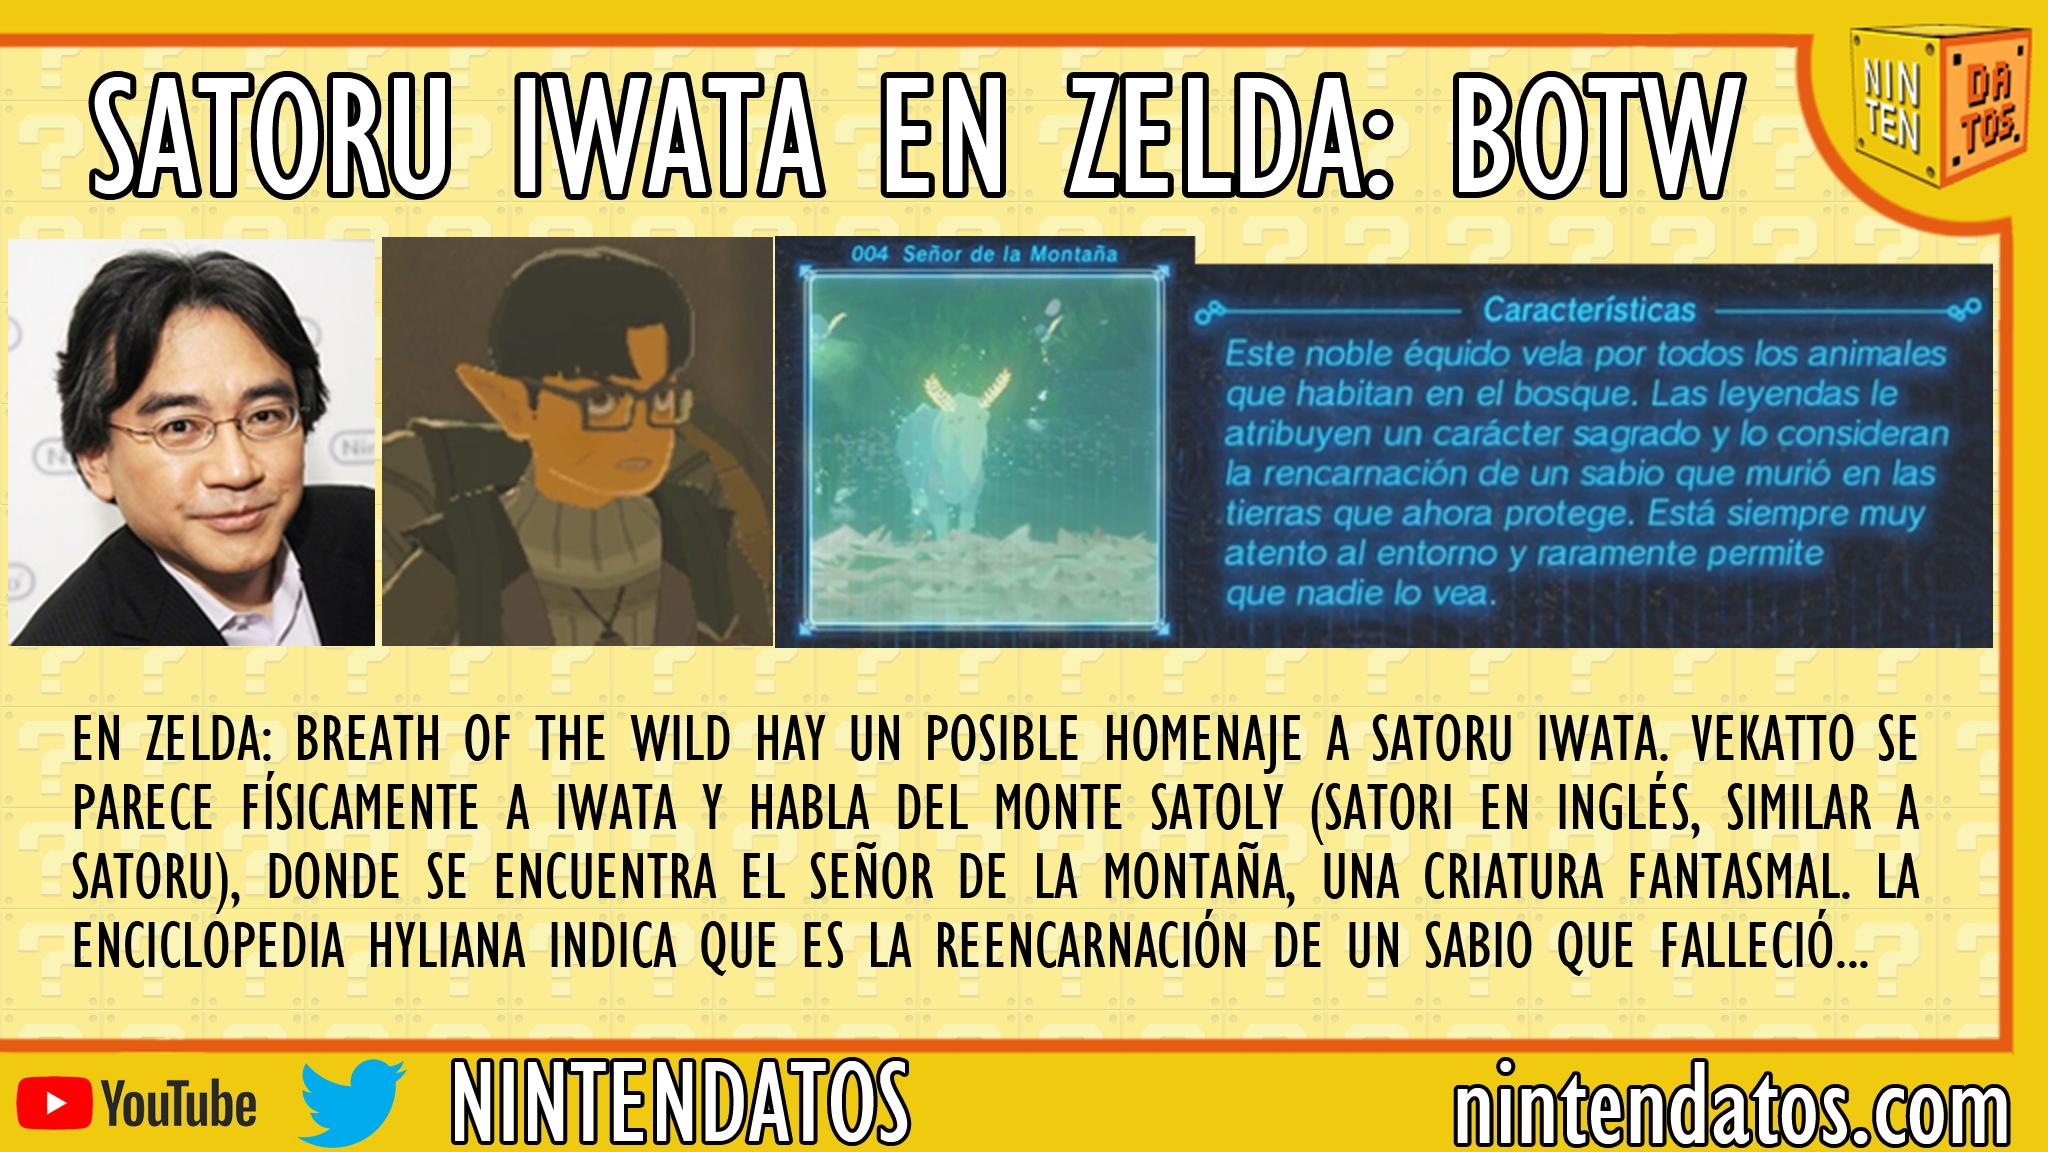 Satoru Iwata en Zelda Breath of the Wild